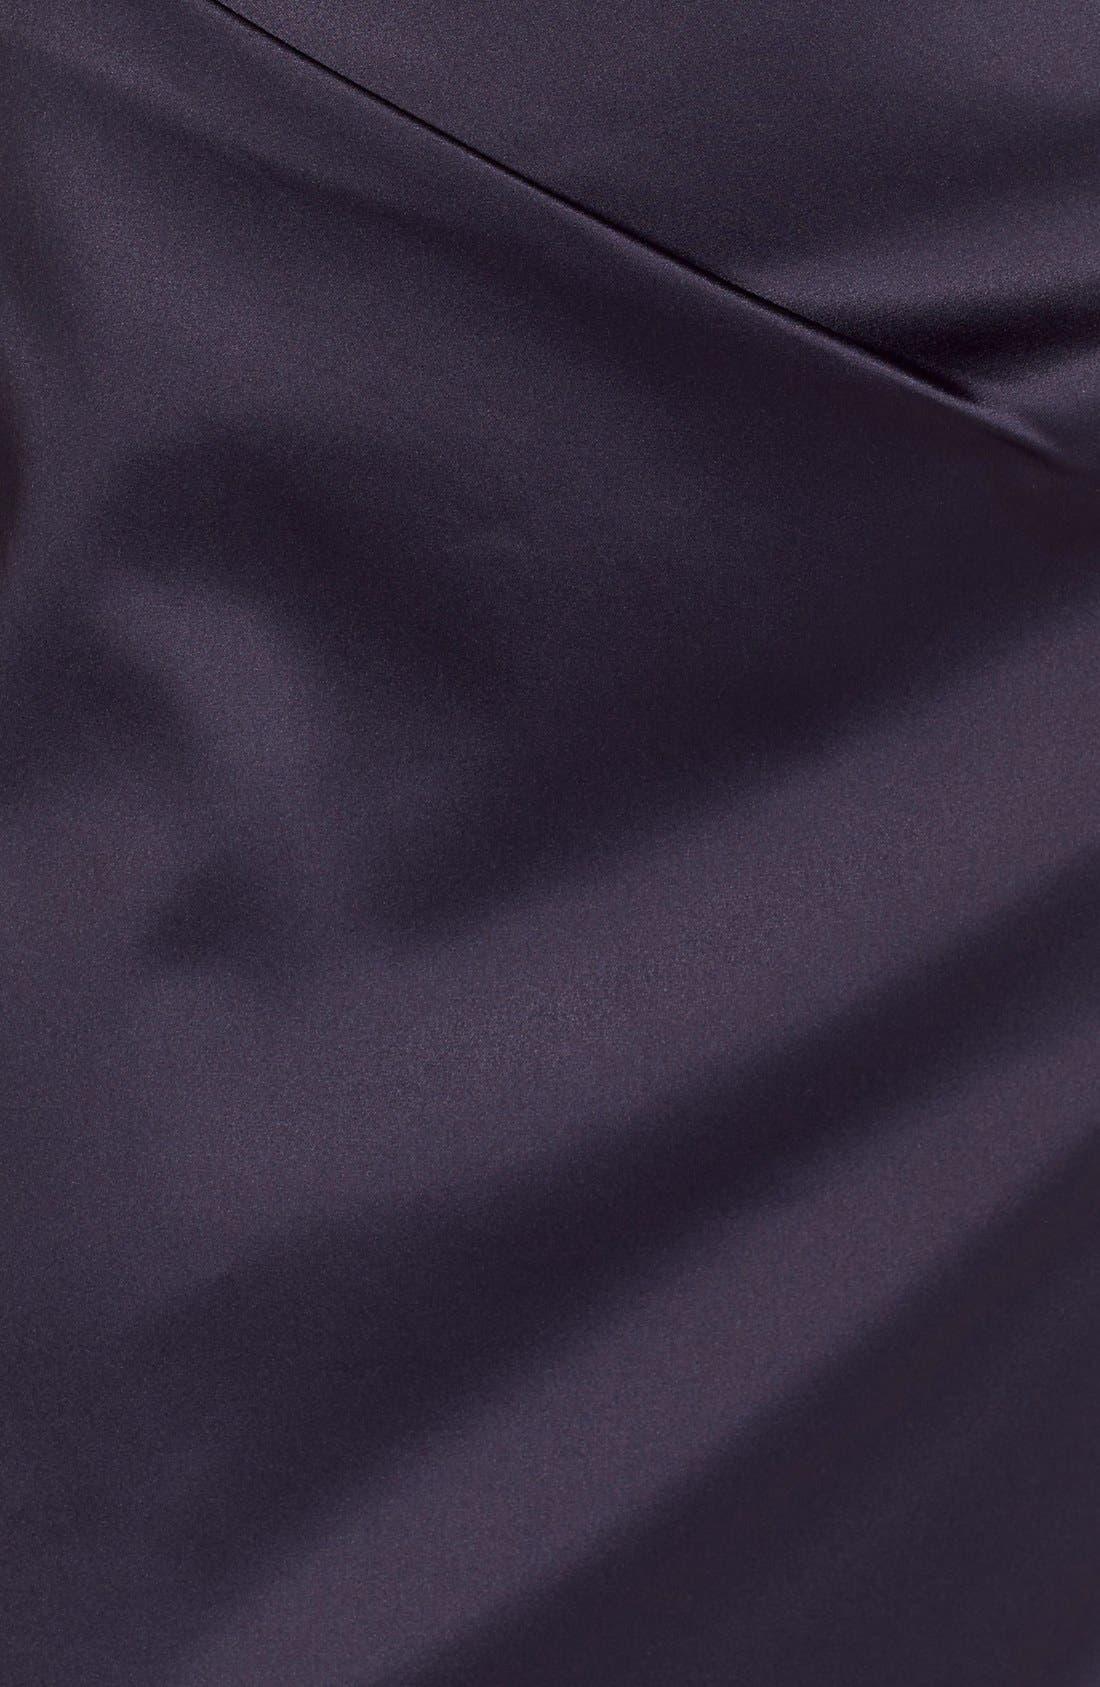 Embellished Neck Sheath Dress,                             Alternate thumbnail 5, color,                             410